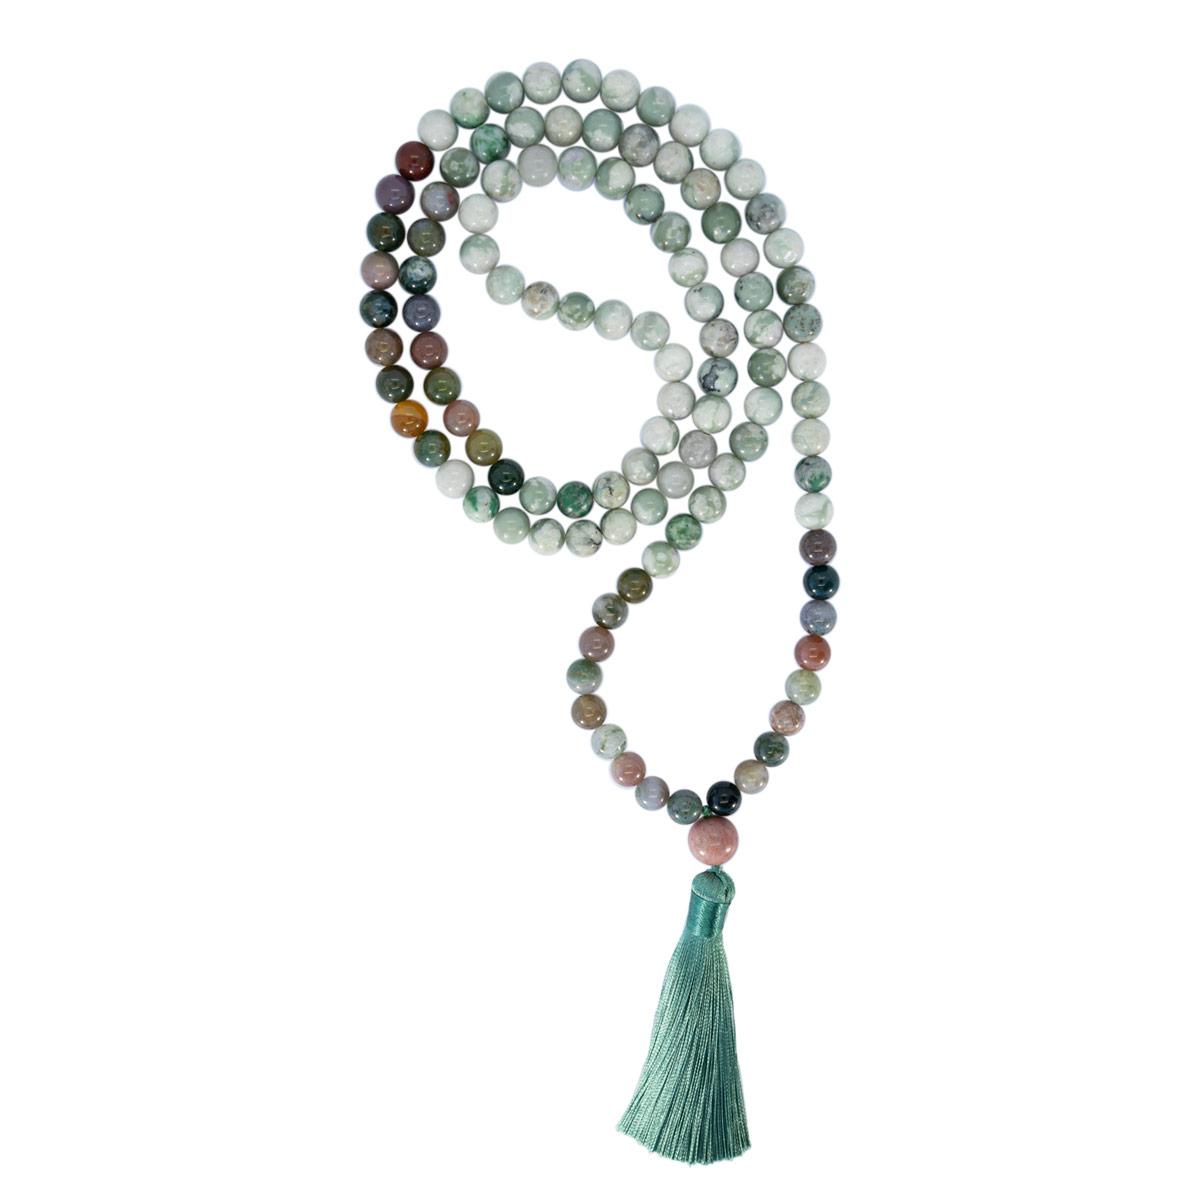 Sri Avinash Blessed™ Jasper & Agate Mala Necklace